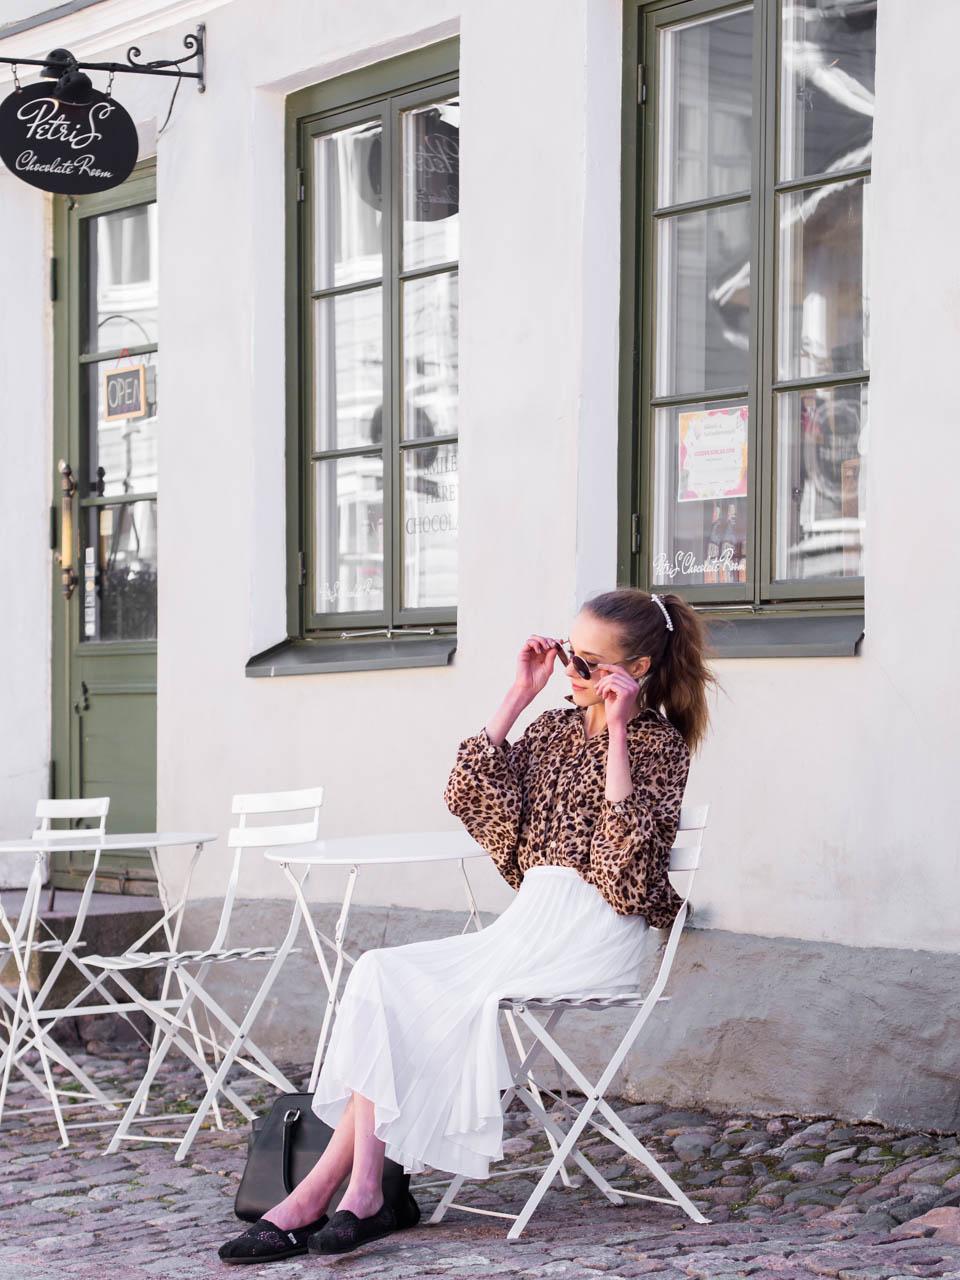 How to wear leopard print - Kuinka pukeutua leopardikuvioon